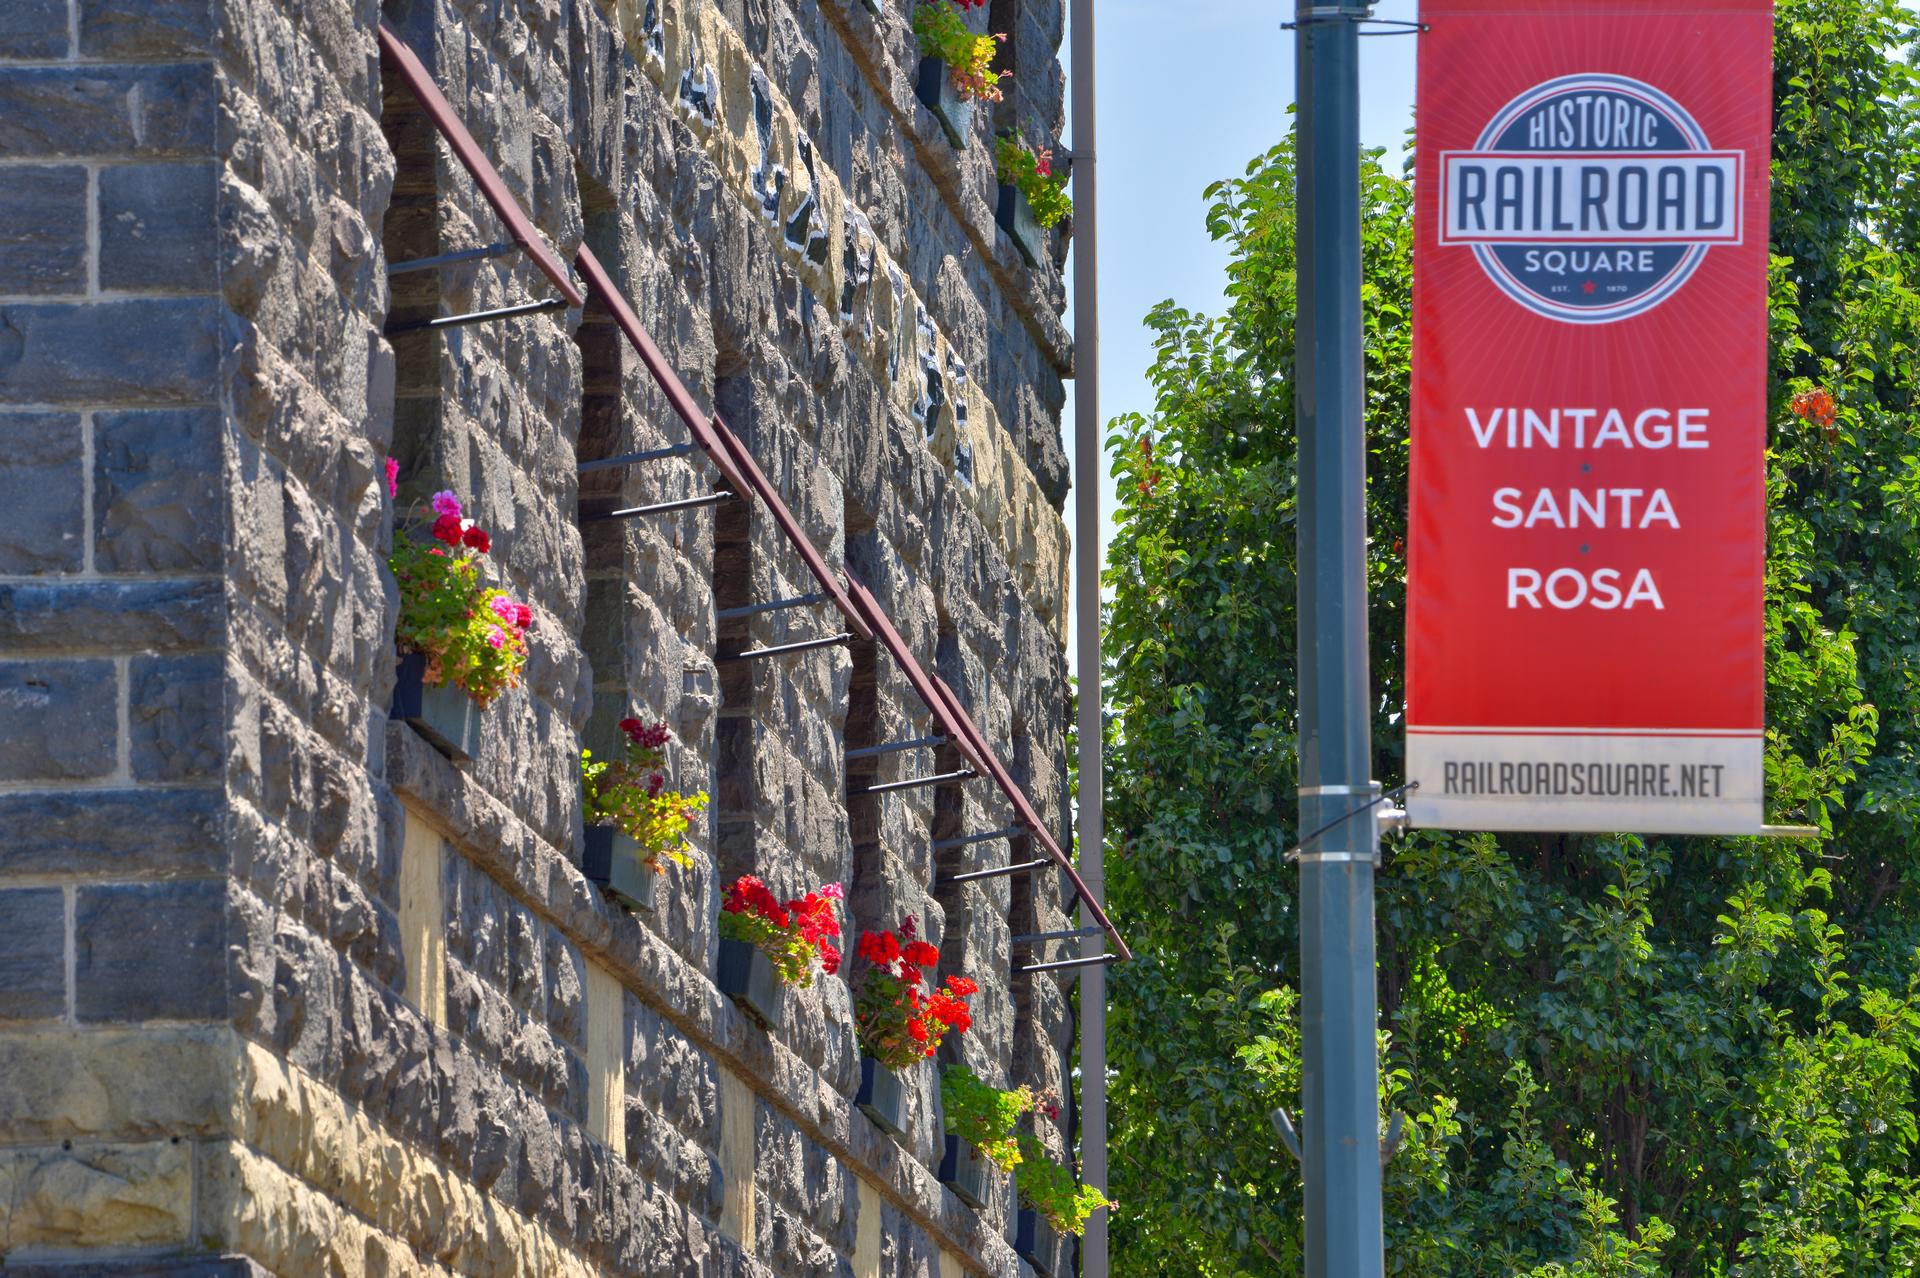 Hotel La Rose in Historic Railroad Square in Santa Rosa, California